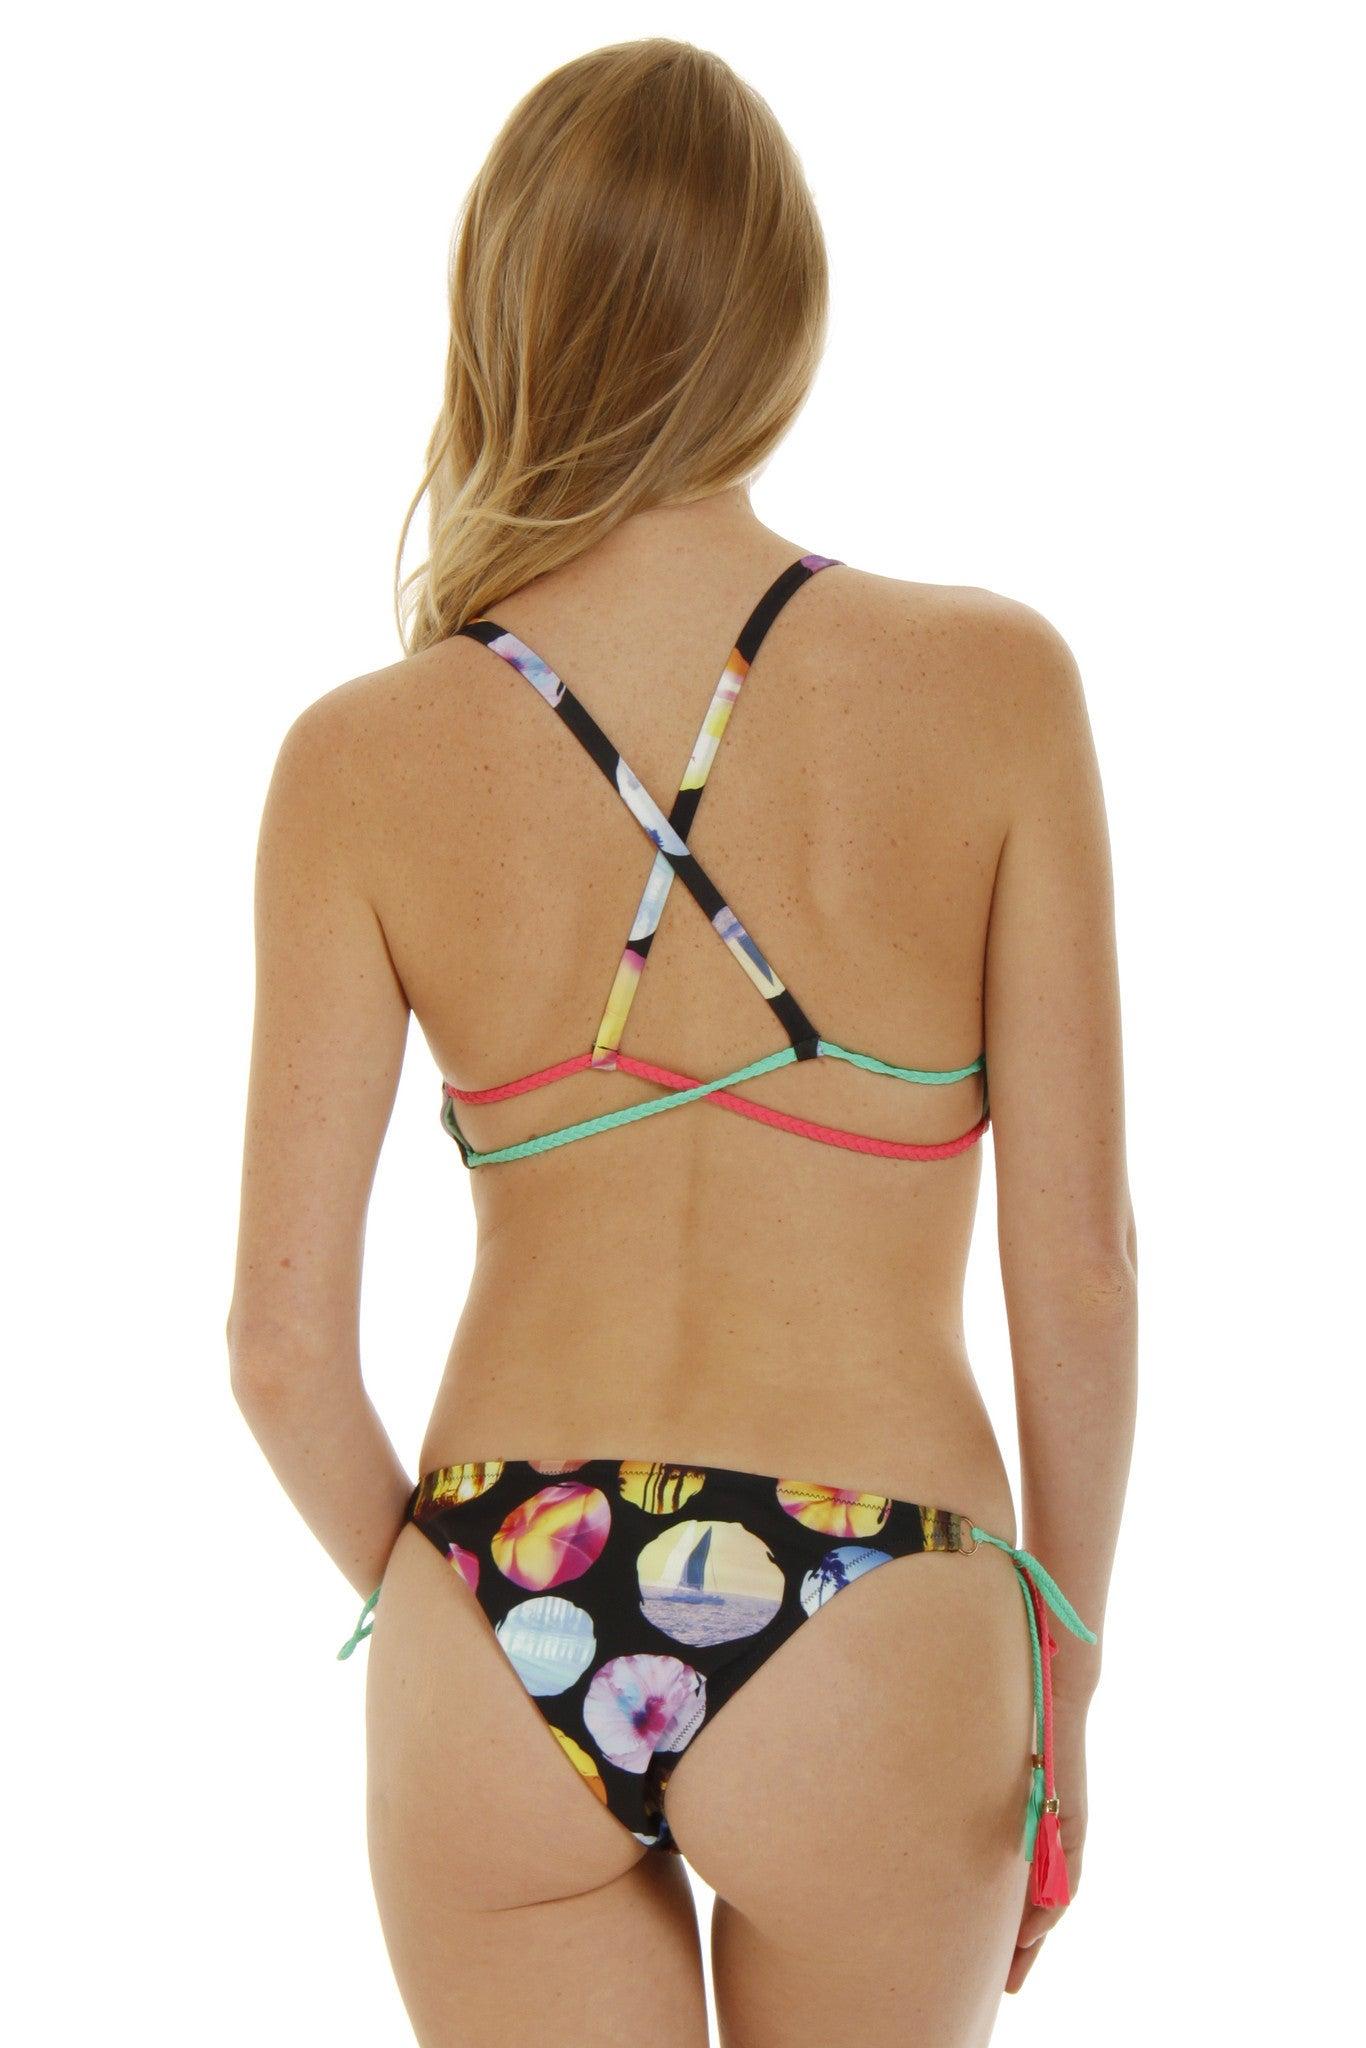 RAISINS Stringer Tie Side Cheeky Bikini Bottom - Cali Coast Print Bikini Bottom | Cali Coast Print| Raisins Stringer Cheeky Bikini Bottom - Cali Coast Print.. Side Ties. Adjustable Fit. Cheeky Coverage.  Back View